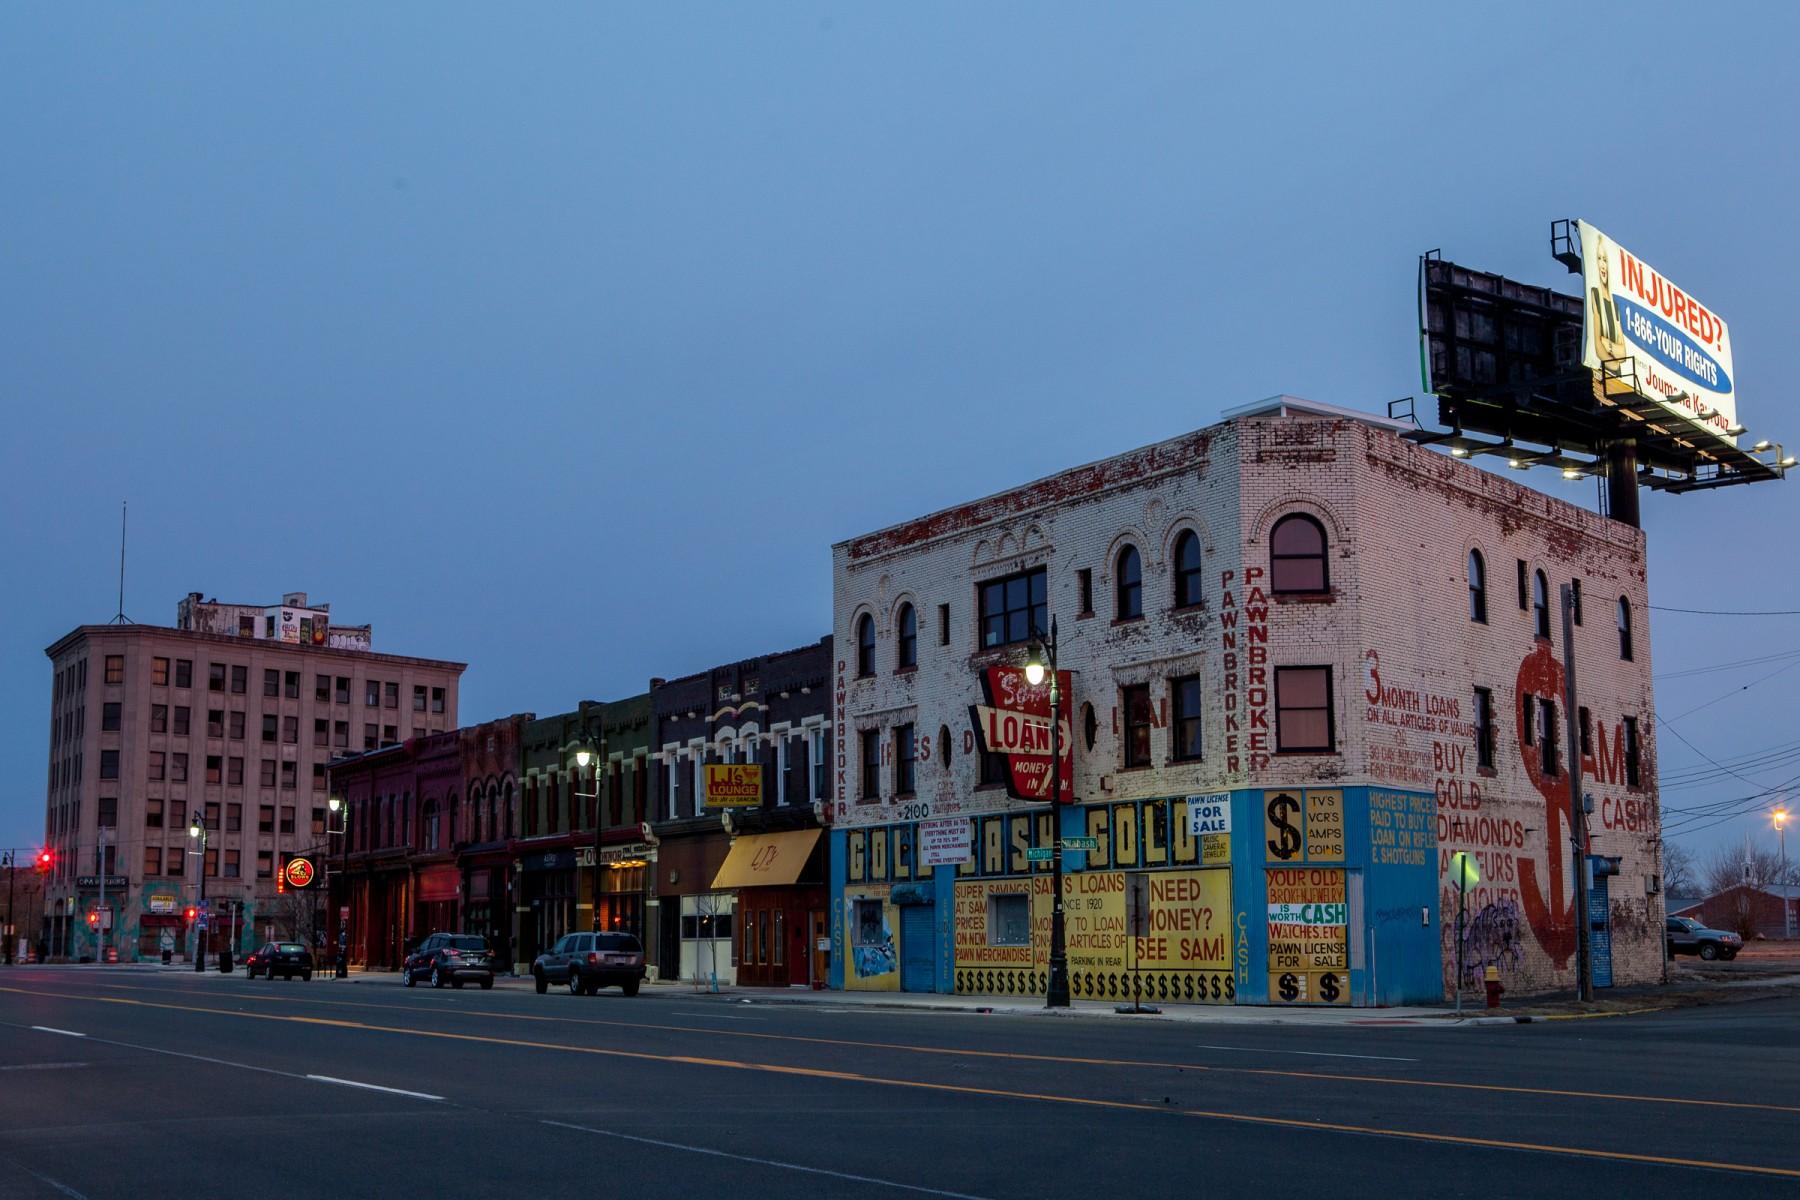 Gentrification in Detroit